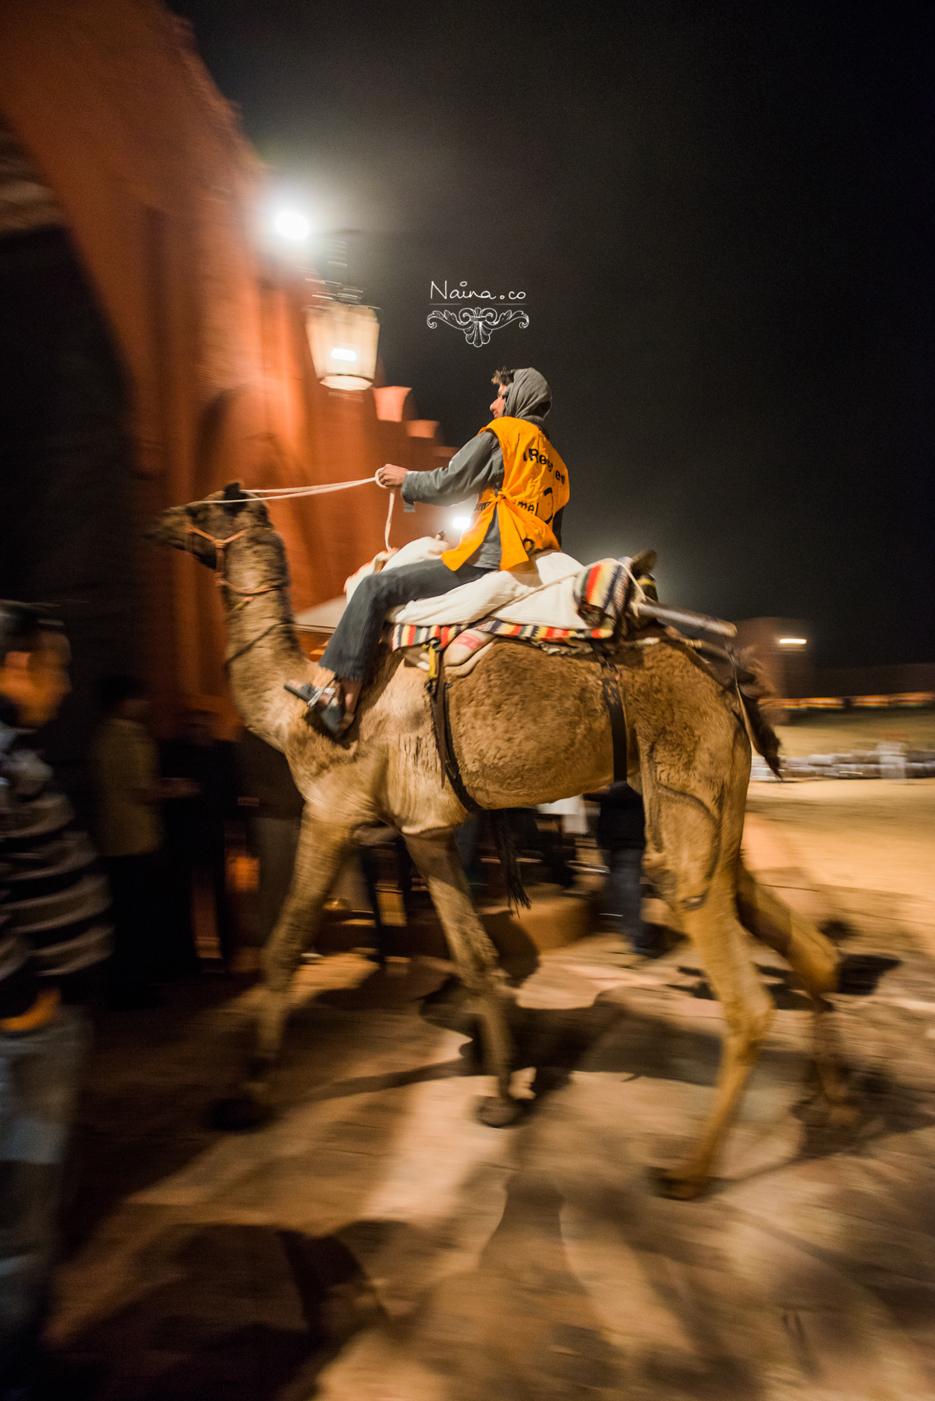 Royal Salute Maharaja of Jodhpur Diamond Jubilee Cup, Osian Reggie's Camel Camp, Camel Polo, photographed by Lifestyle photographer, blogger Naina Redhu of Naina.co